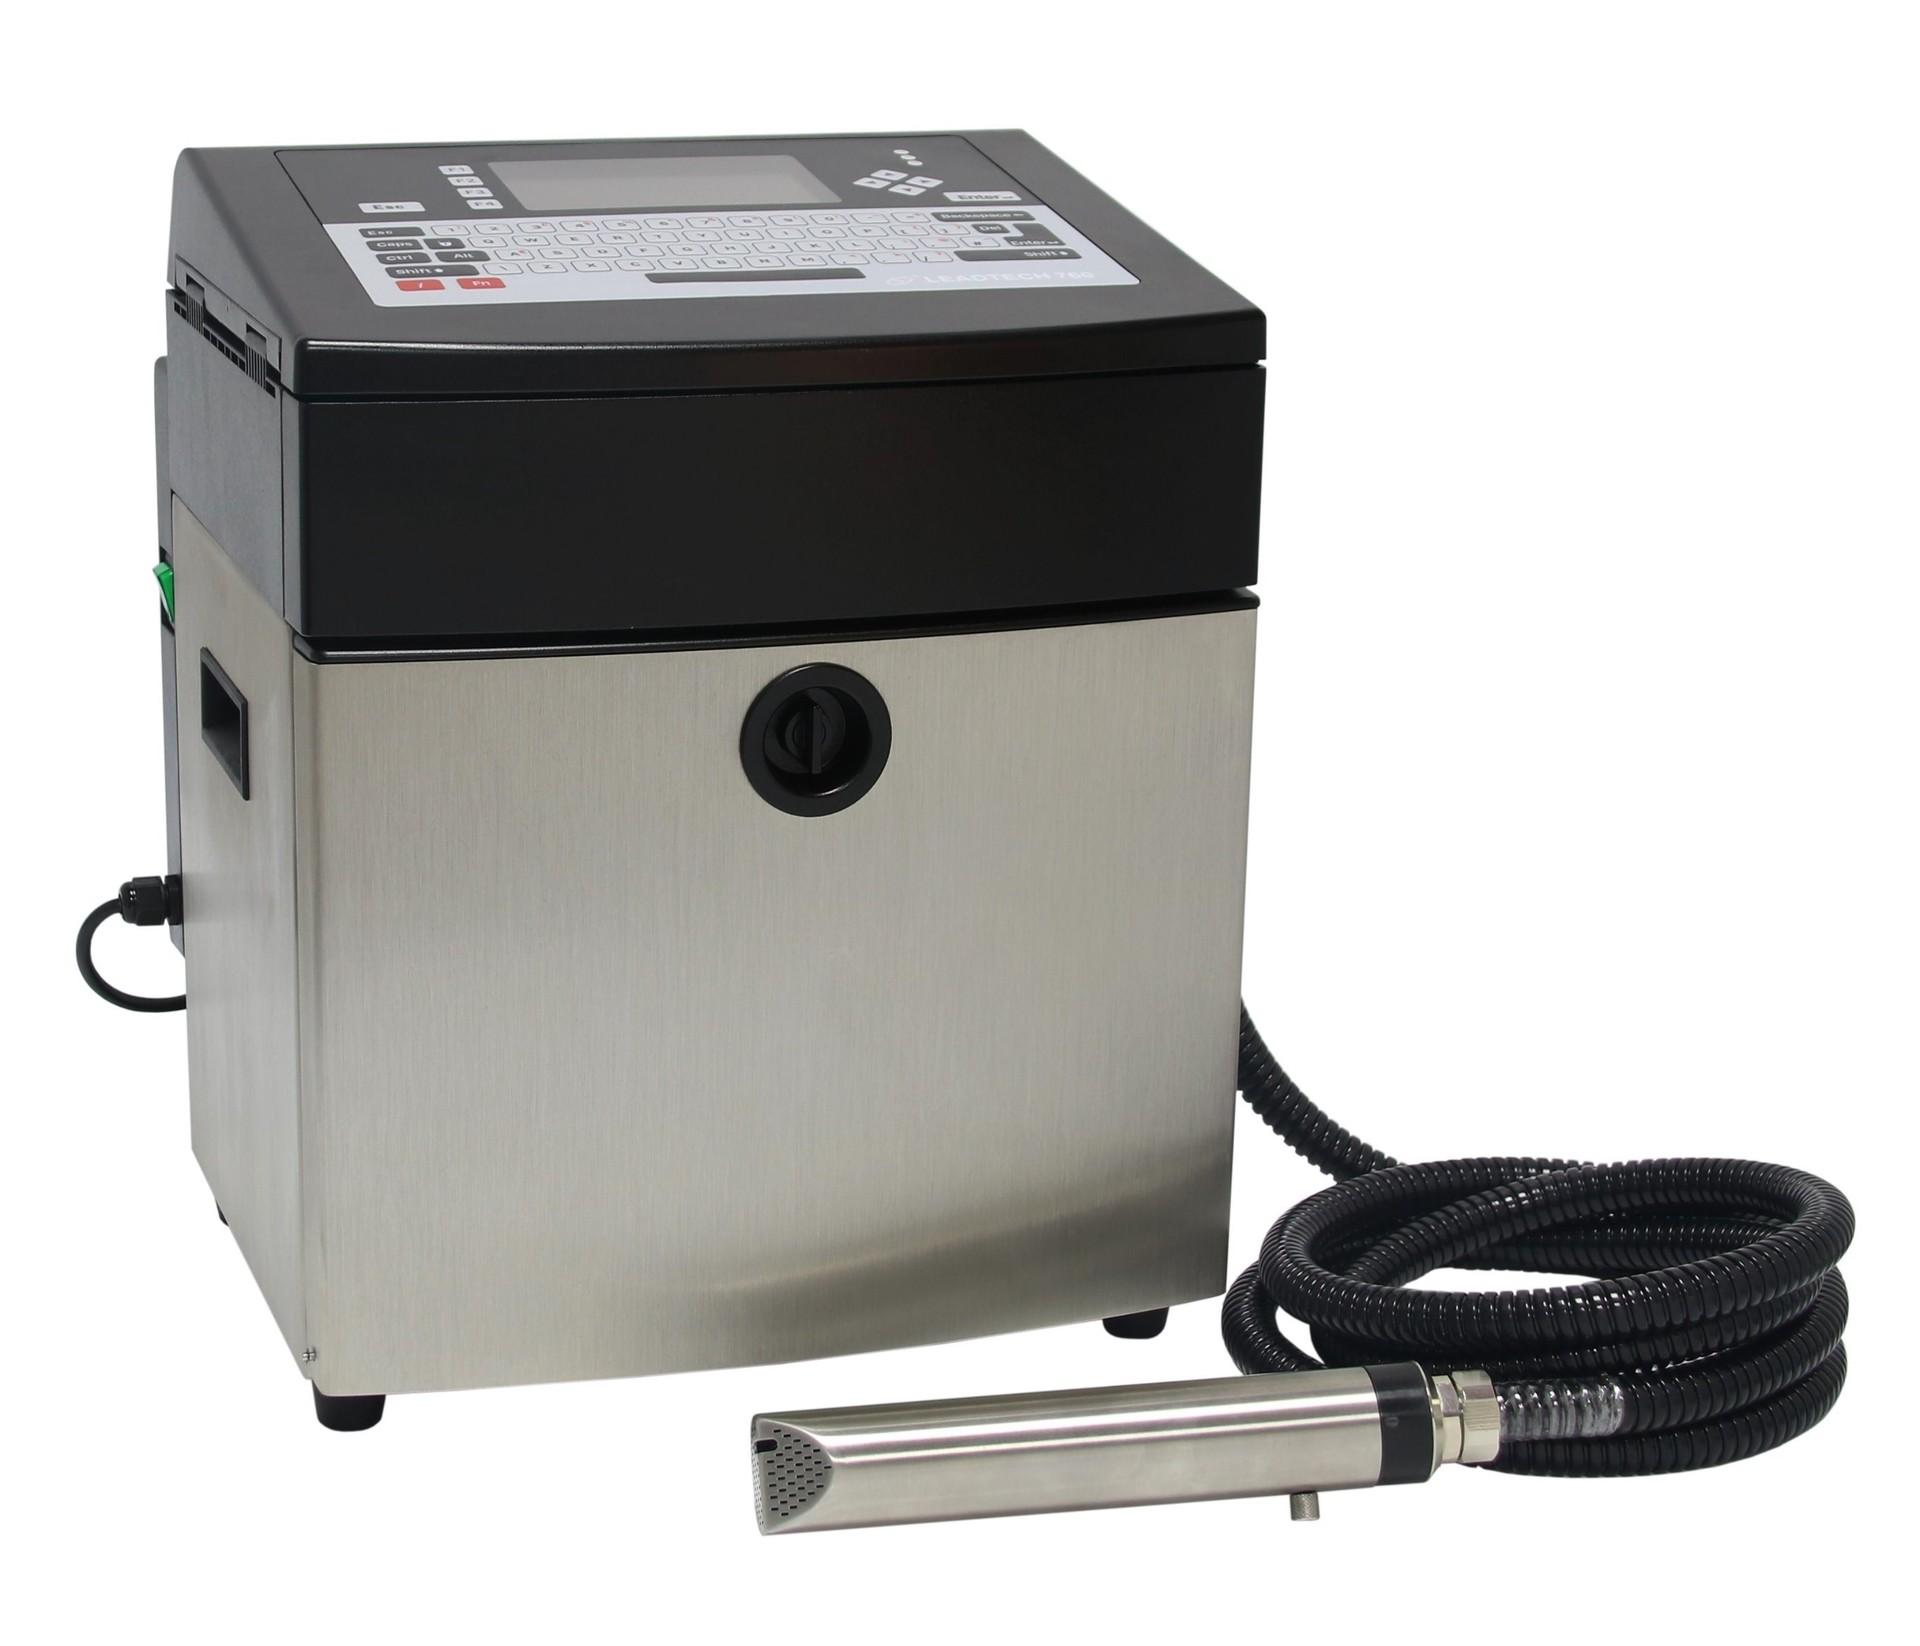 Lead Tech Lt760 HDPE Coding Cij Inkjet Printer